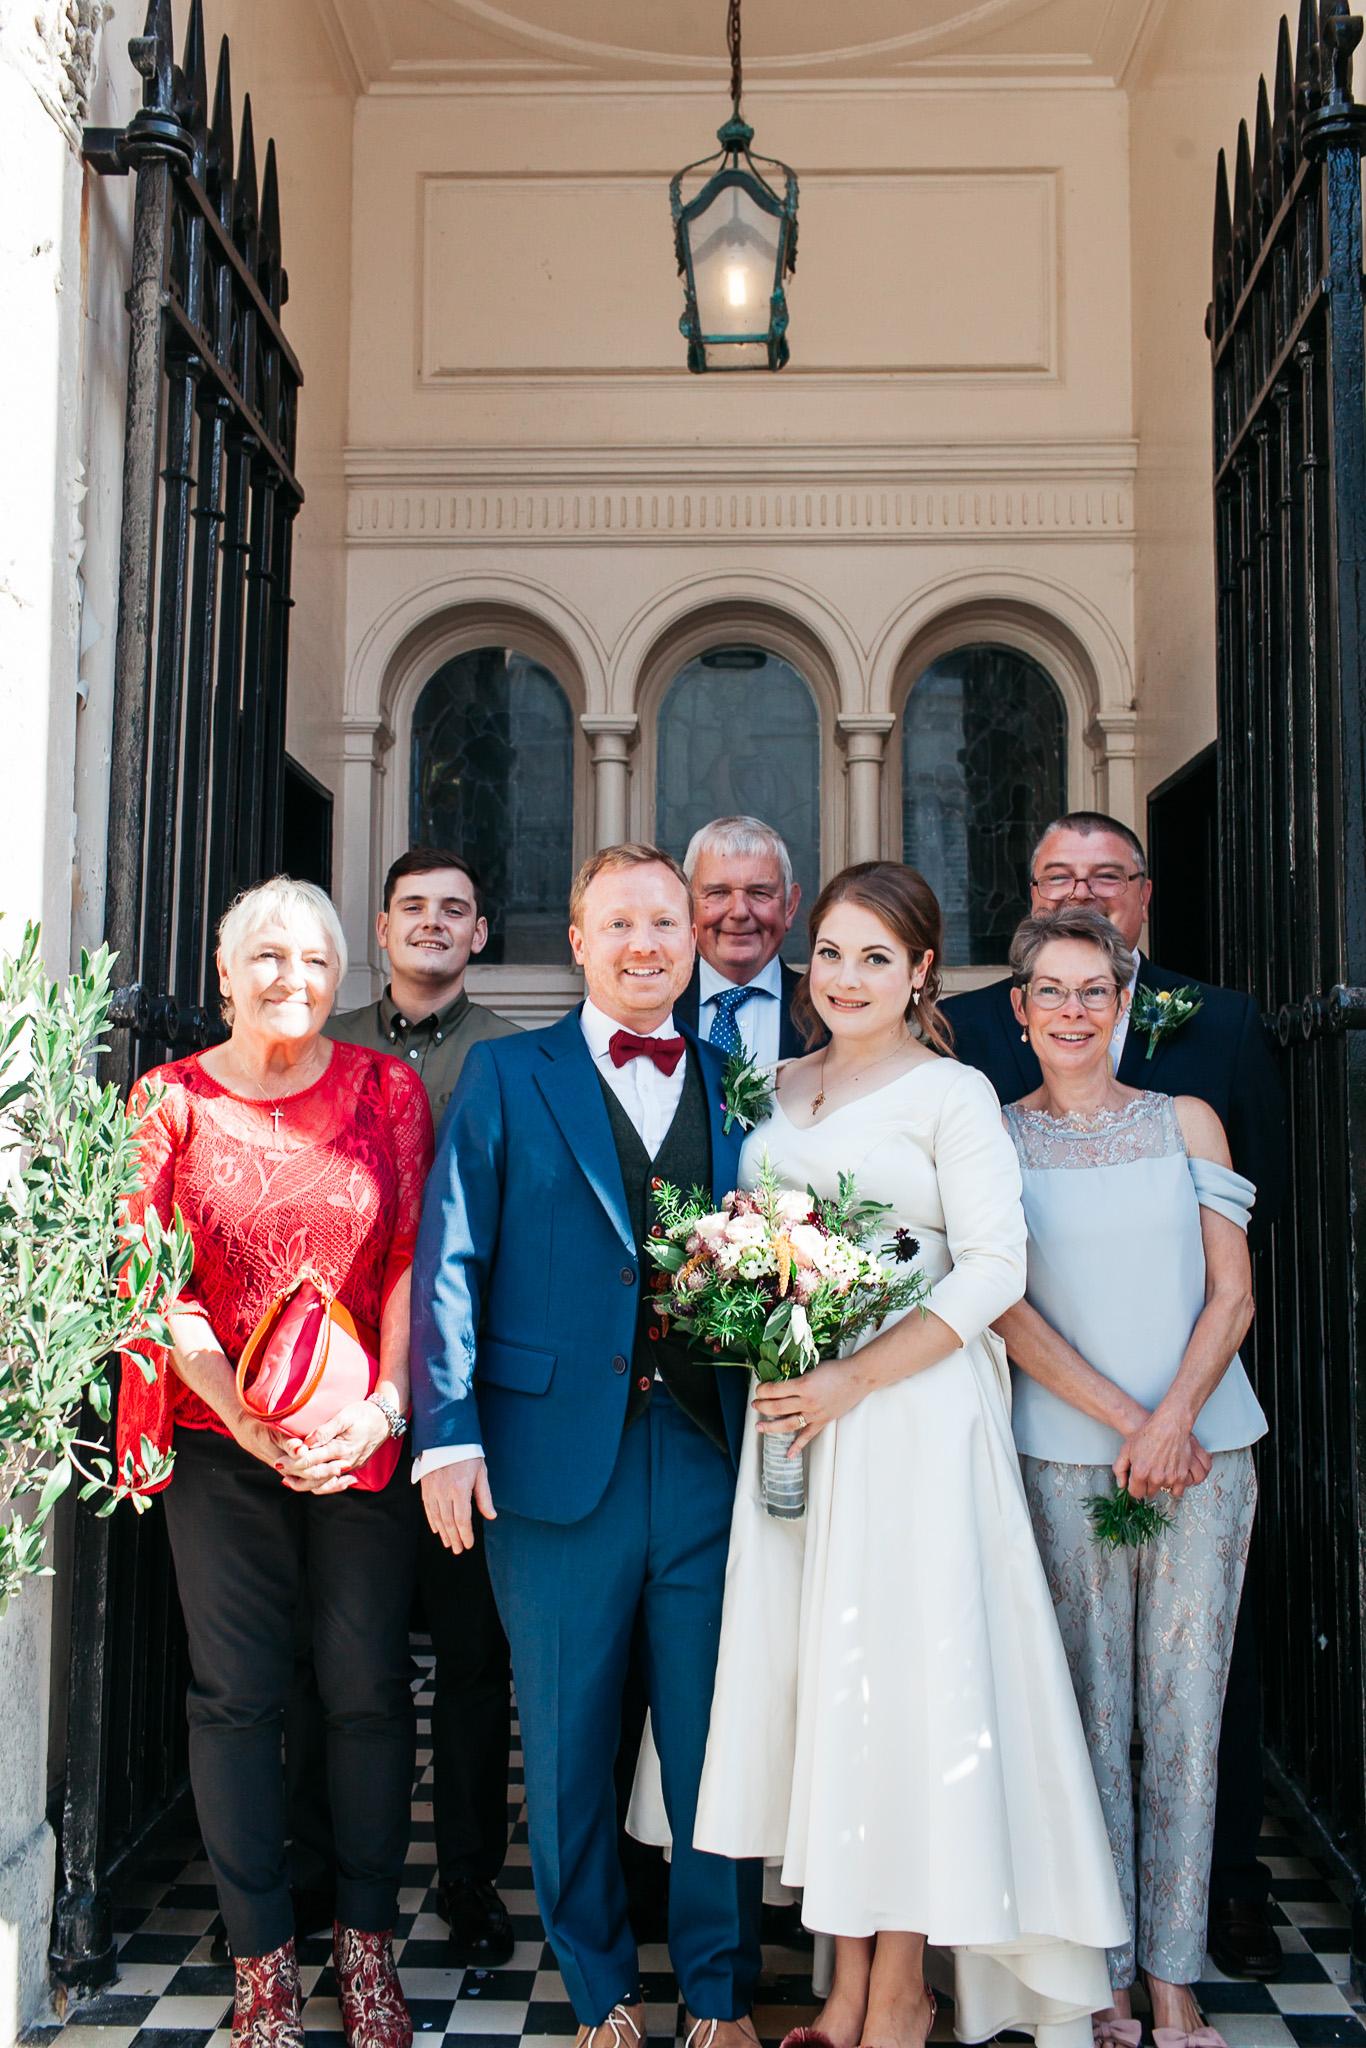 st_andrews_fabrica_brighton_wedding_570.jpg